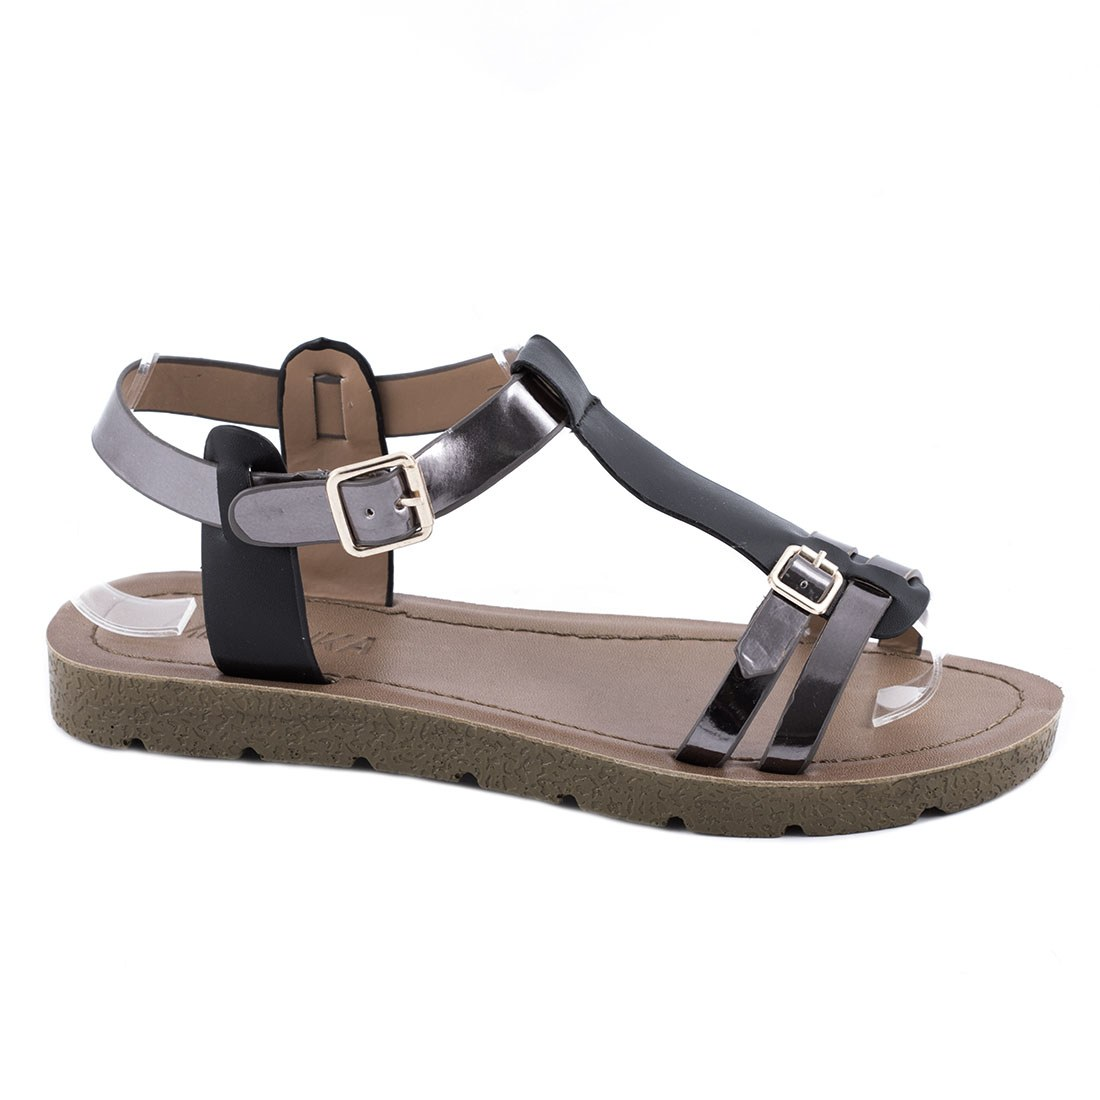 Sandale dama cu barete JK-60-NEGRU